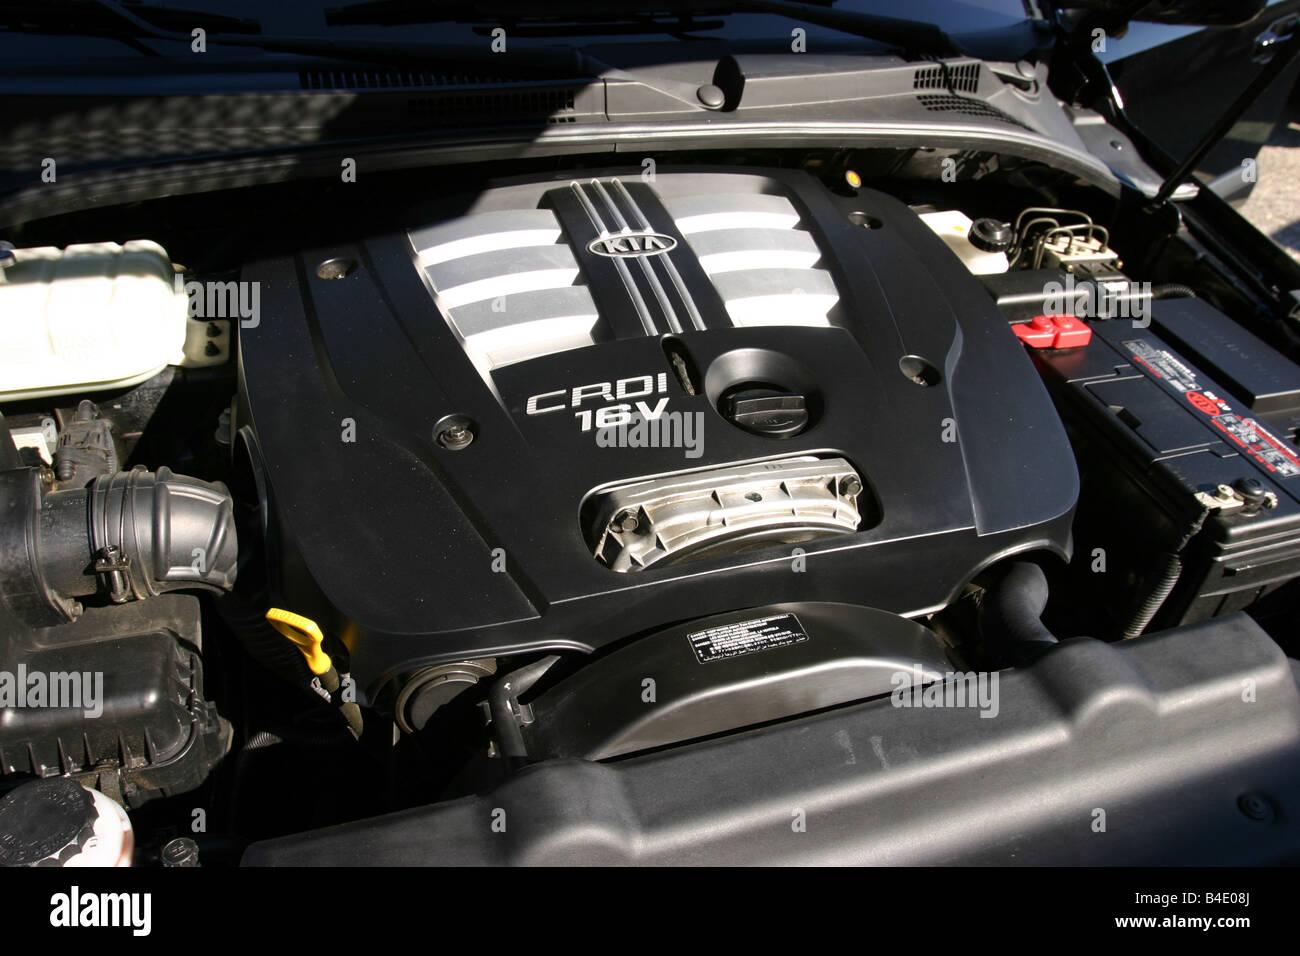 Auto, Kia Sorento, Langlauf Fahrzeug Modelljahr 2002-, schwarz ...